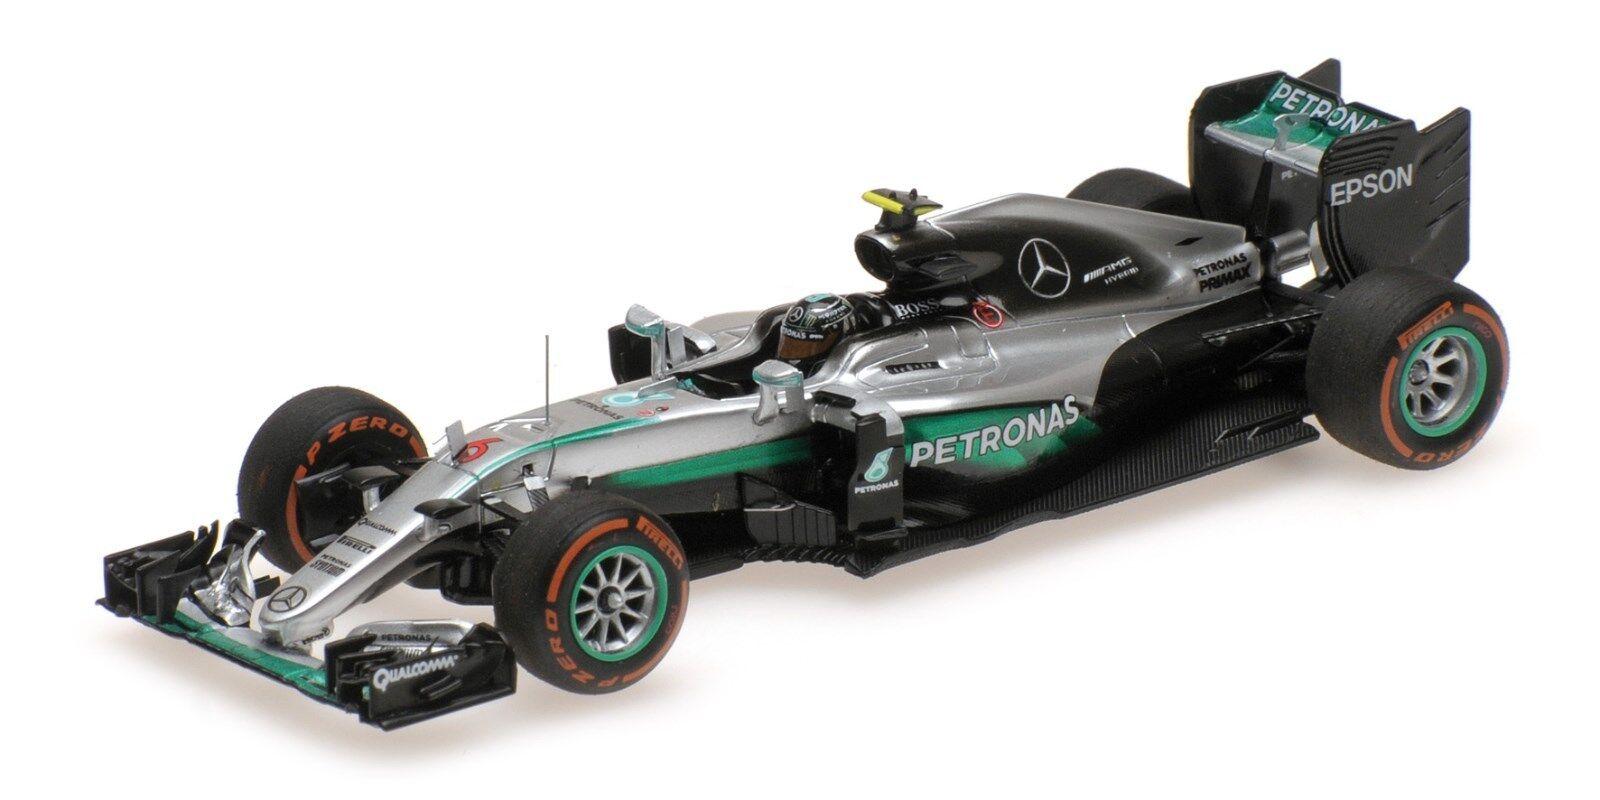 Mercedes AMG w07 Rosberg Winner Japanese GP disparaitra 09.10.2016 417160506 1 43 new